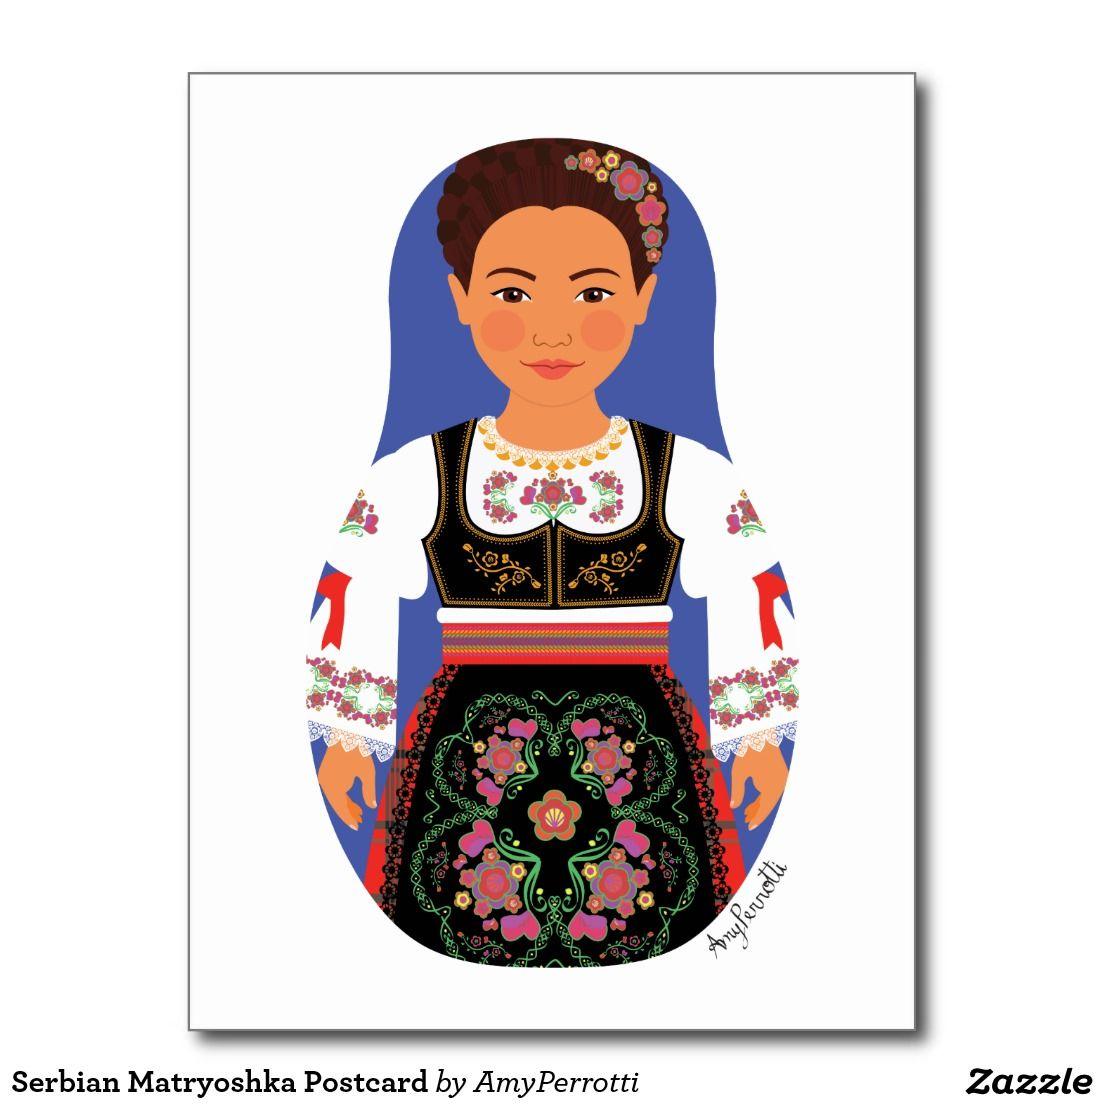 Serbian Matryoshka Postcard